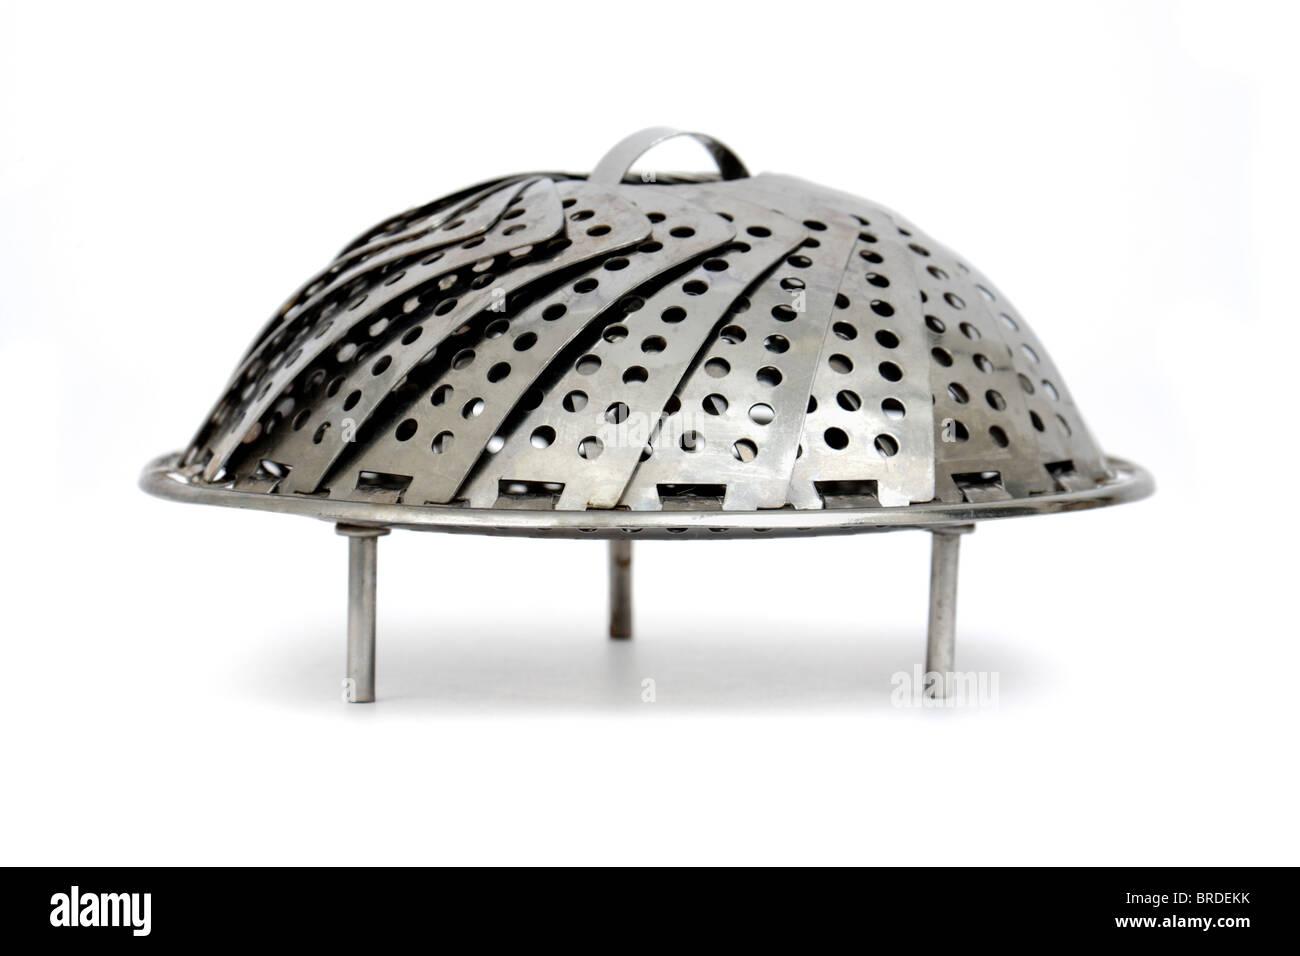 Vintage stainless steel folding spiral vegetable steamer (closed) - Stock Image